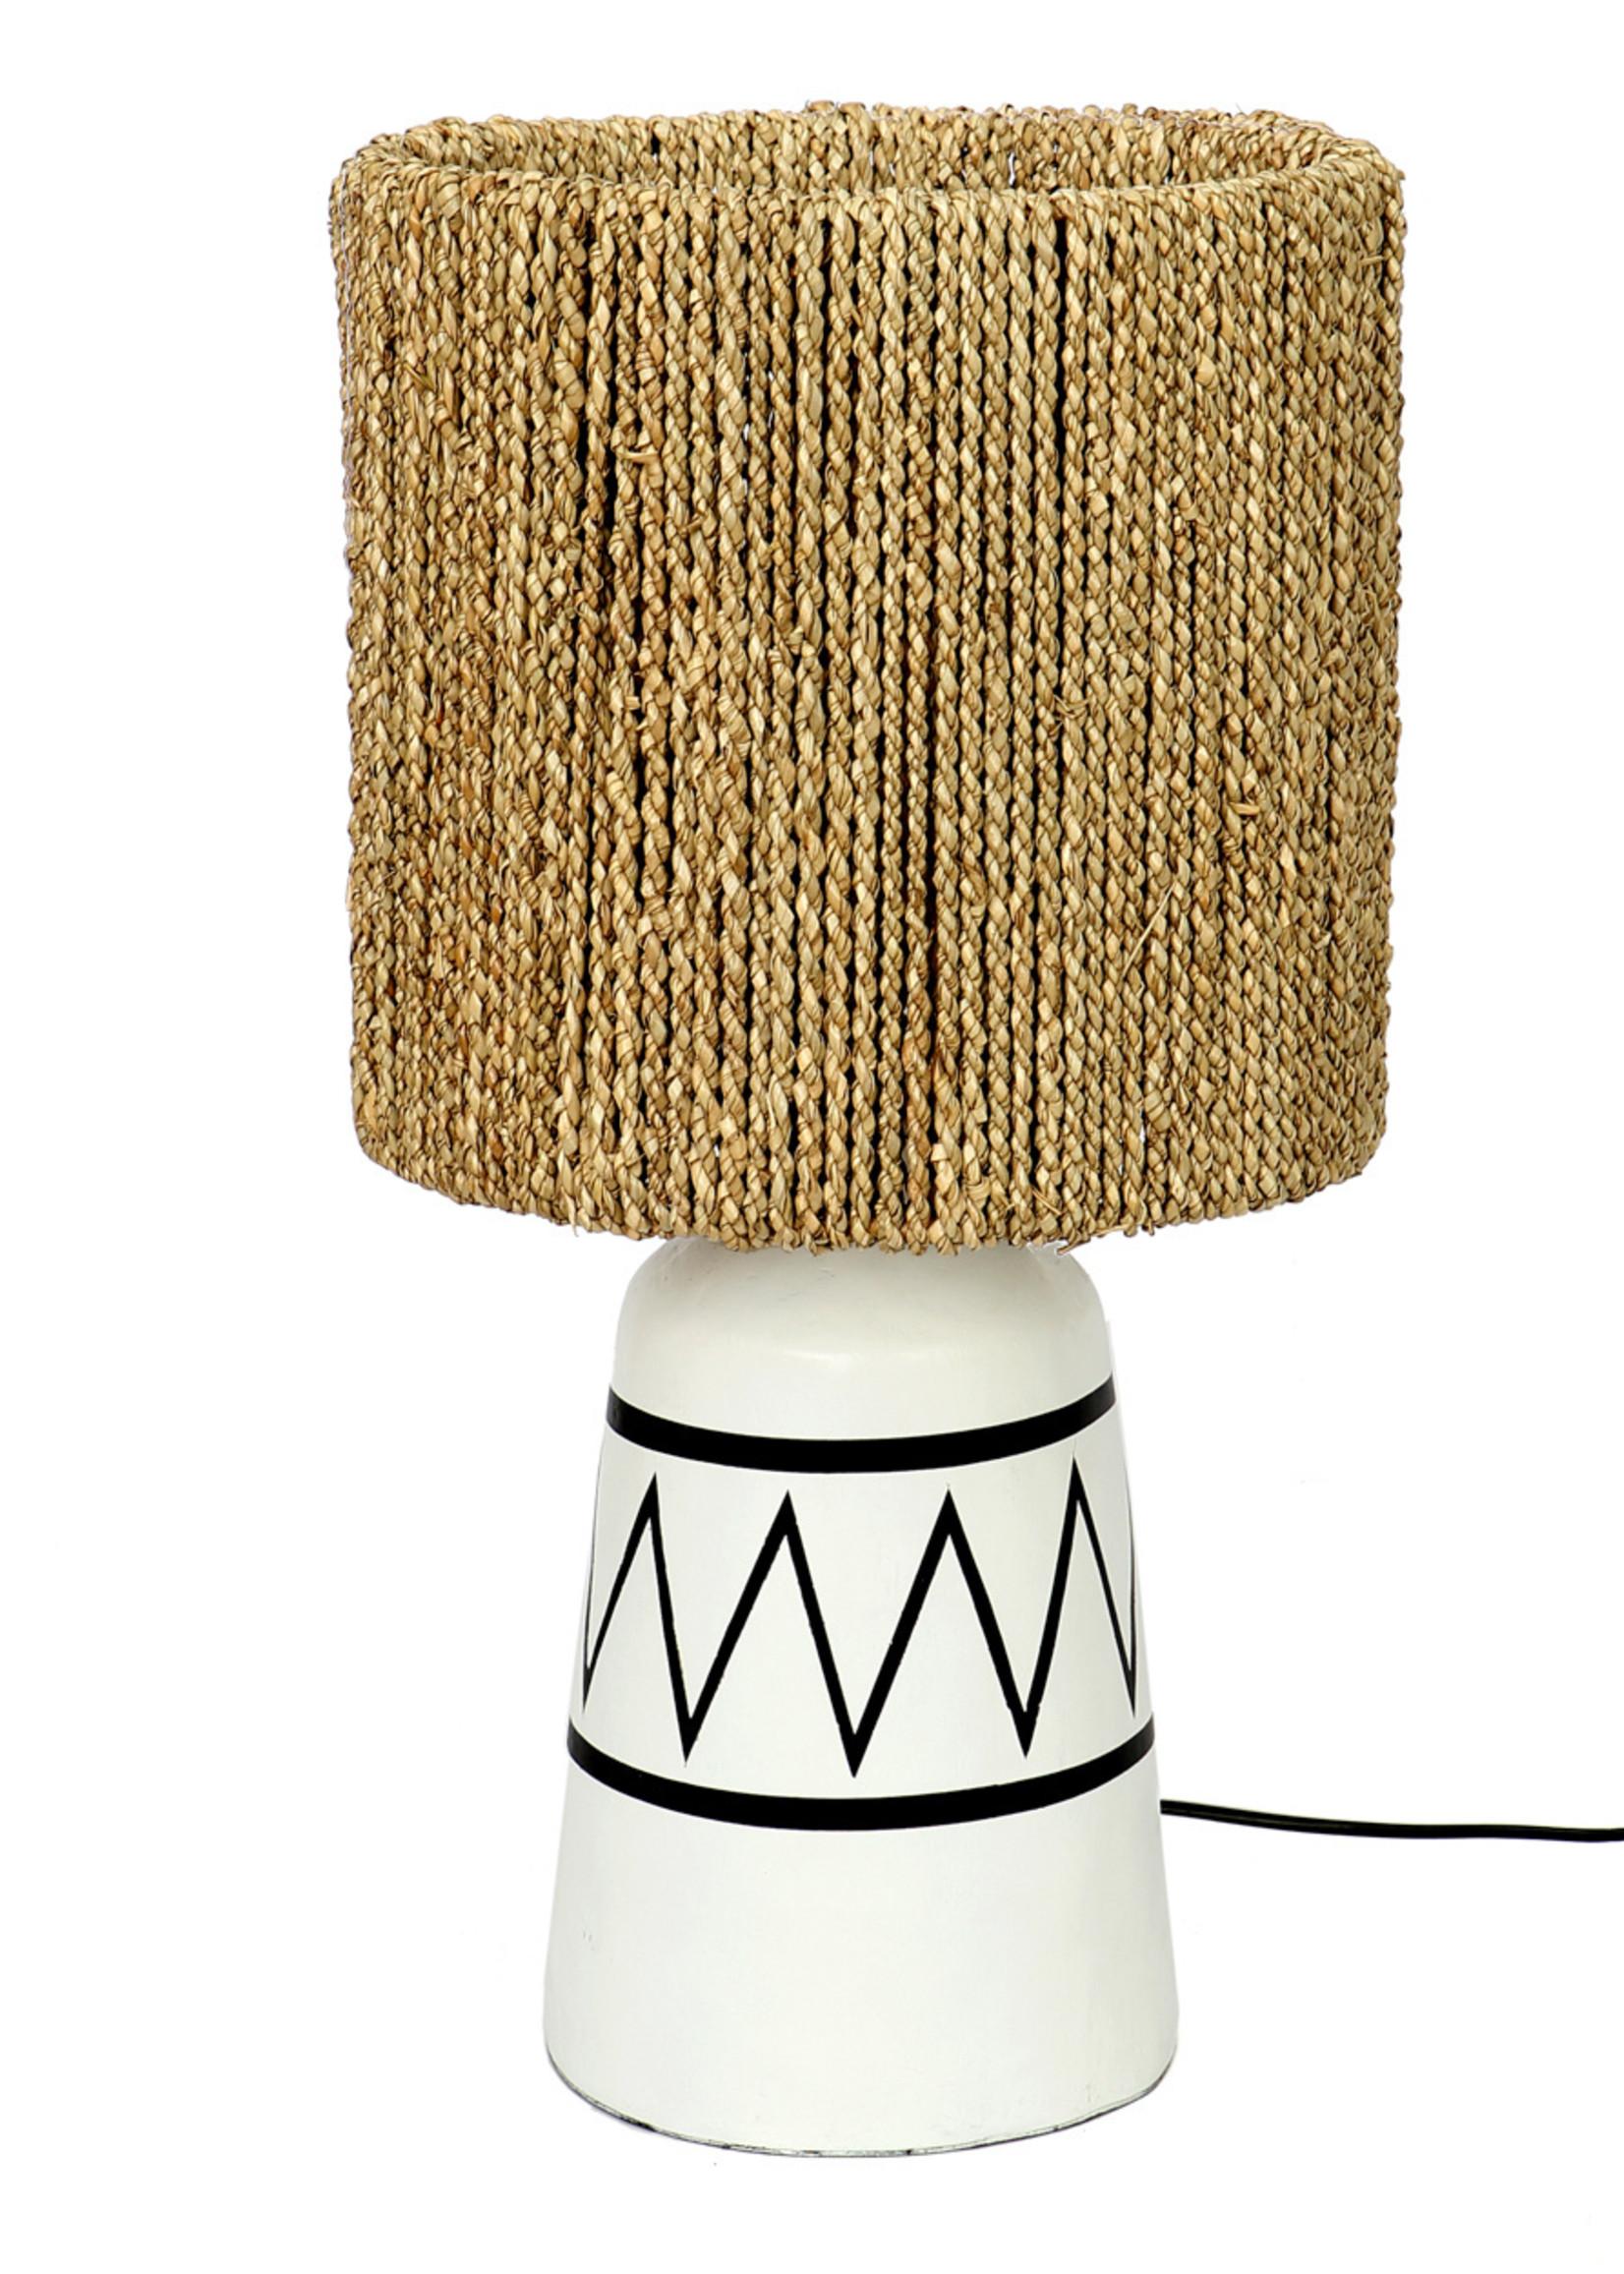 The Santorini Table Lamp - White Black and Natural